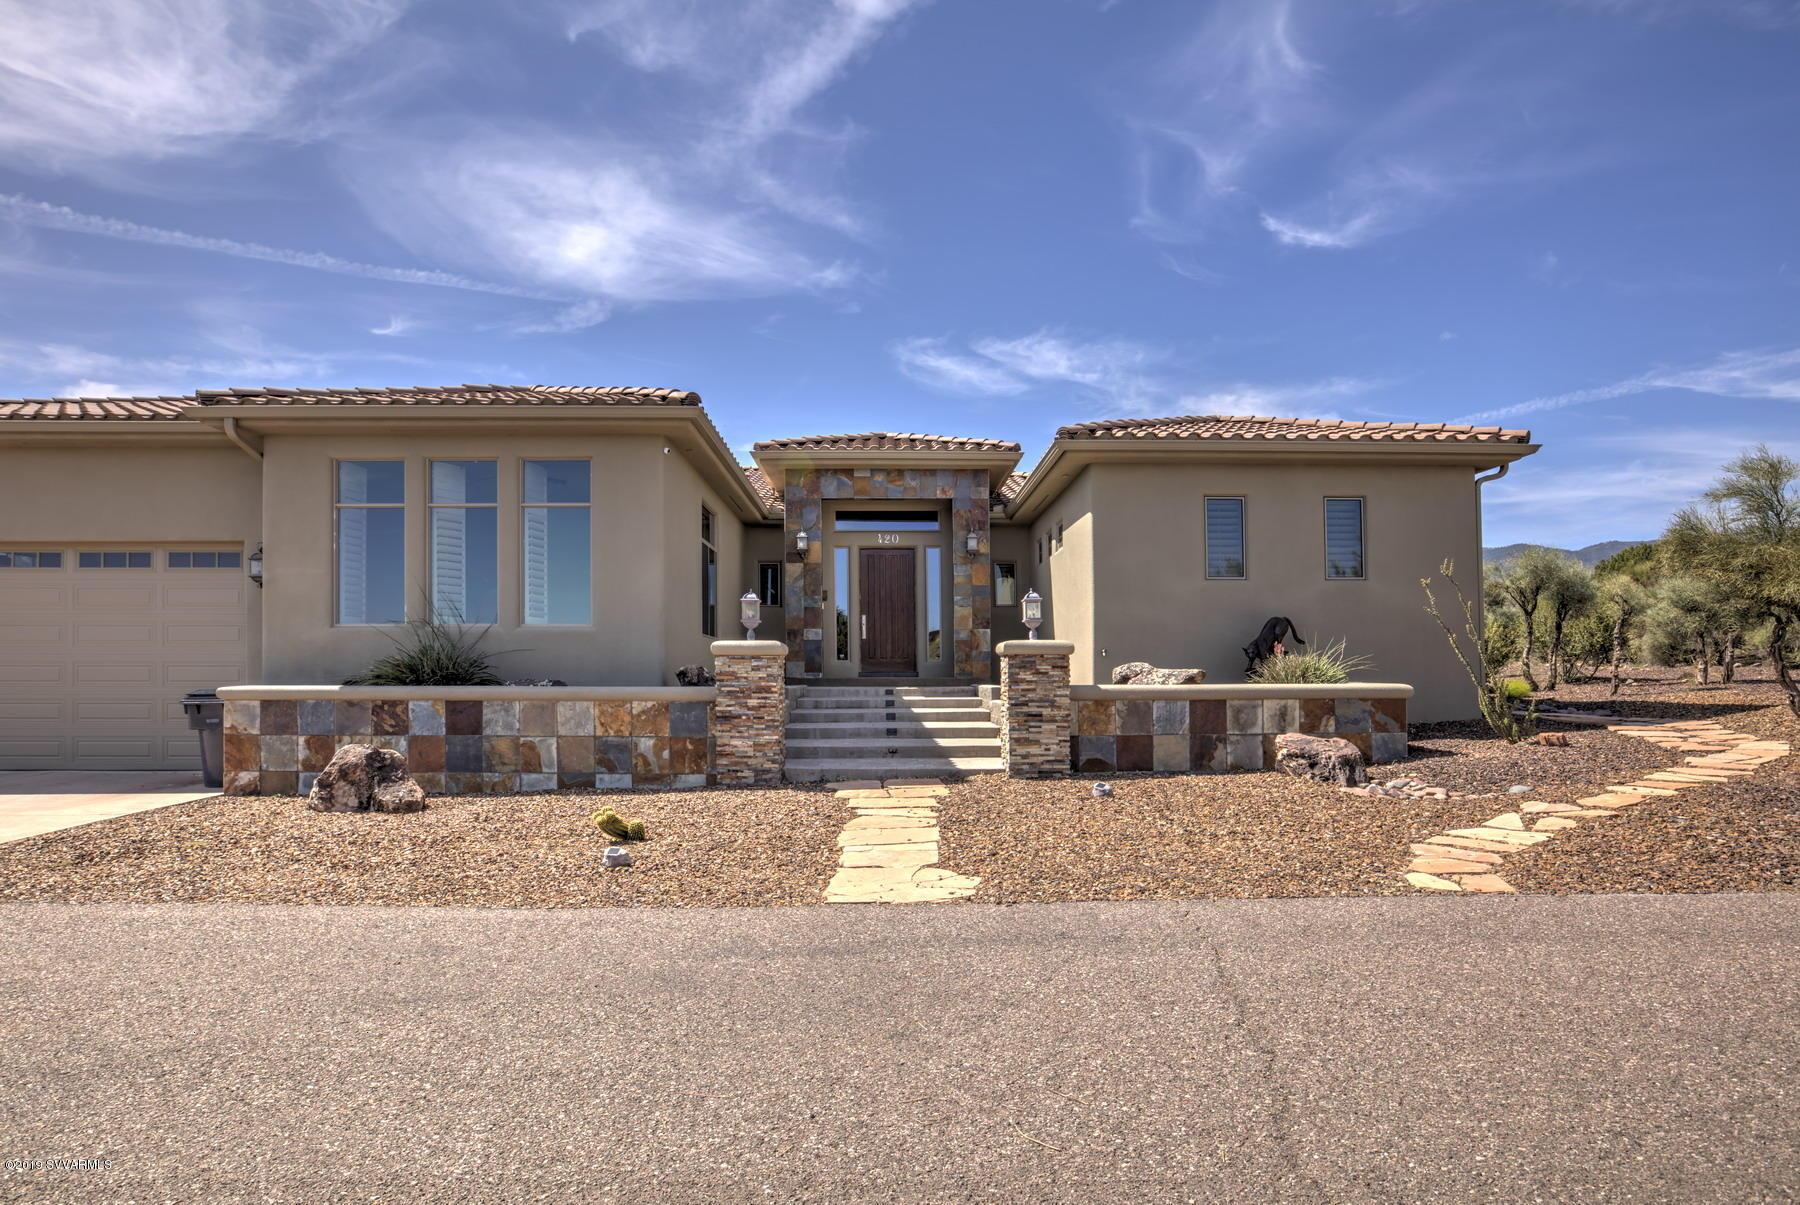 Photo of 420 E Shadow Ridge Rd, Cottonwood, AZ 86326